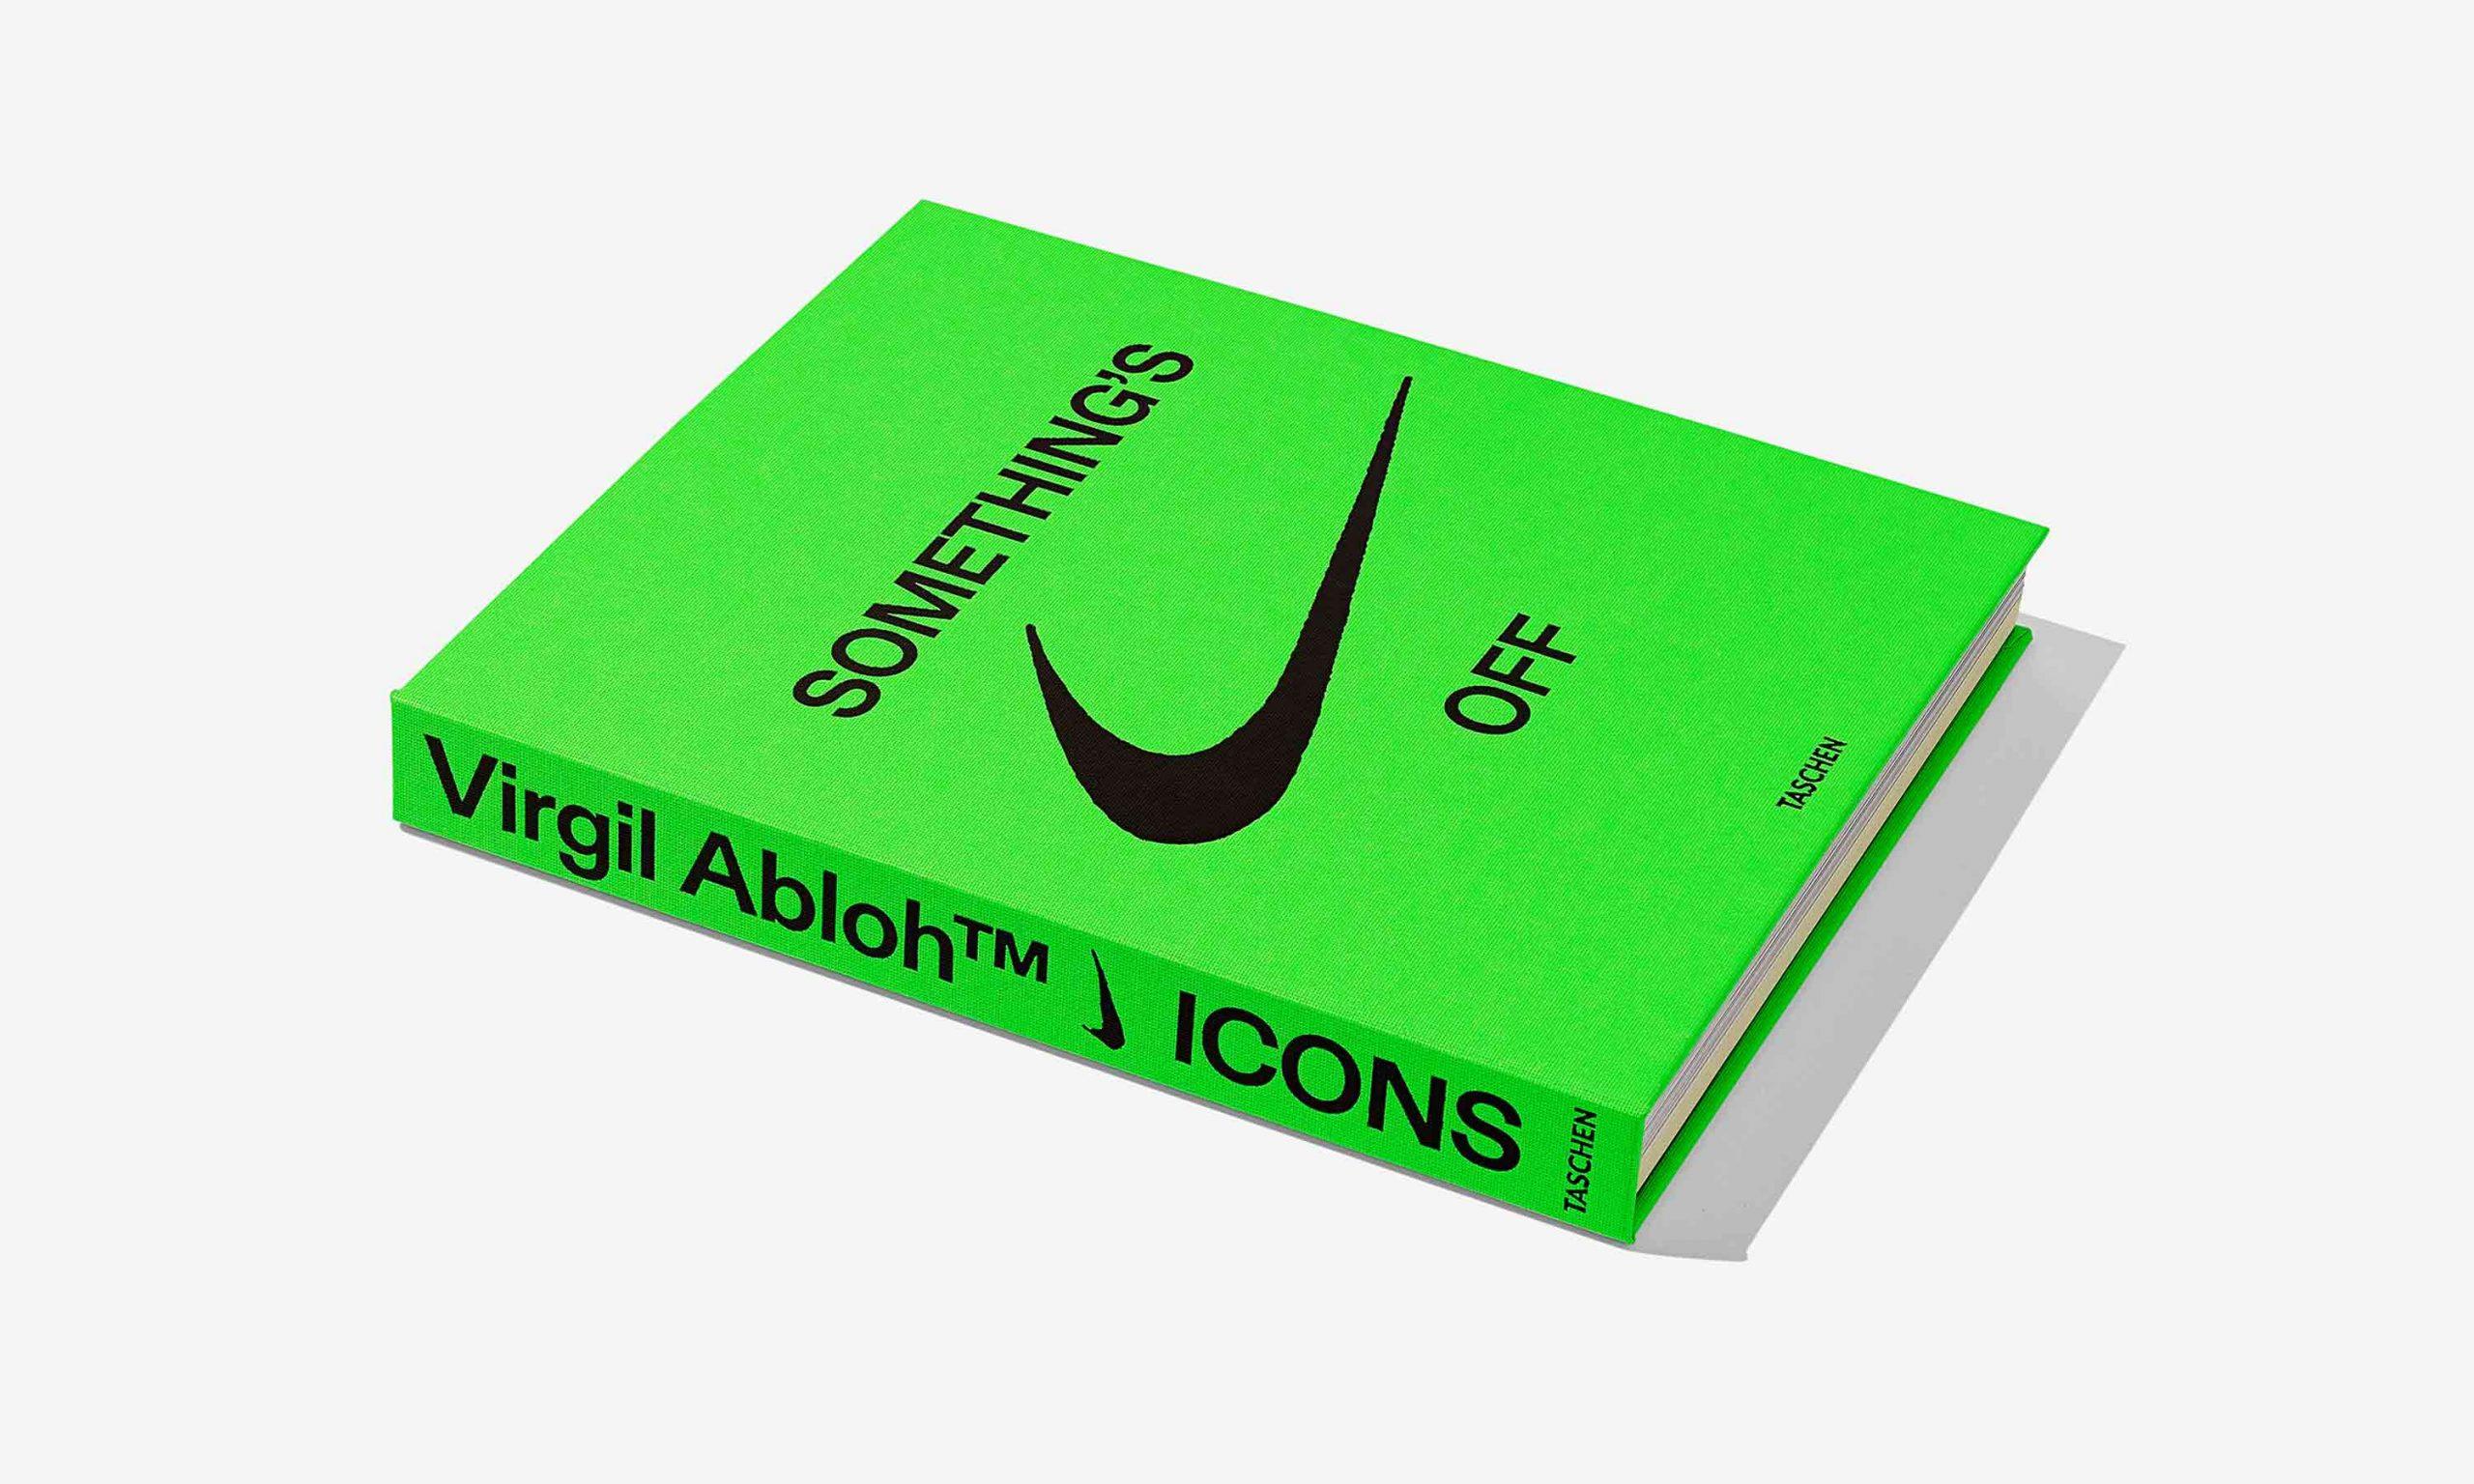 THE TEN「Archive」,Virgil Abloh 携手 Nike 出品《ICONS》档案册